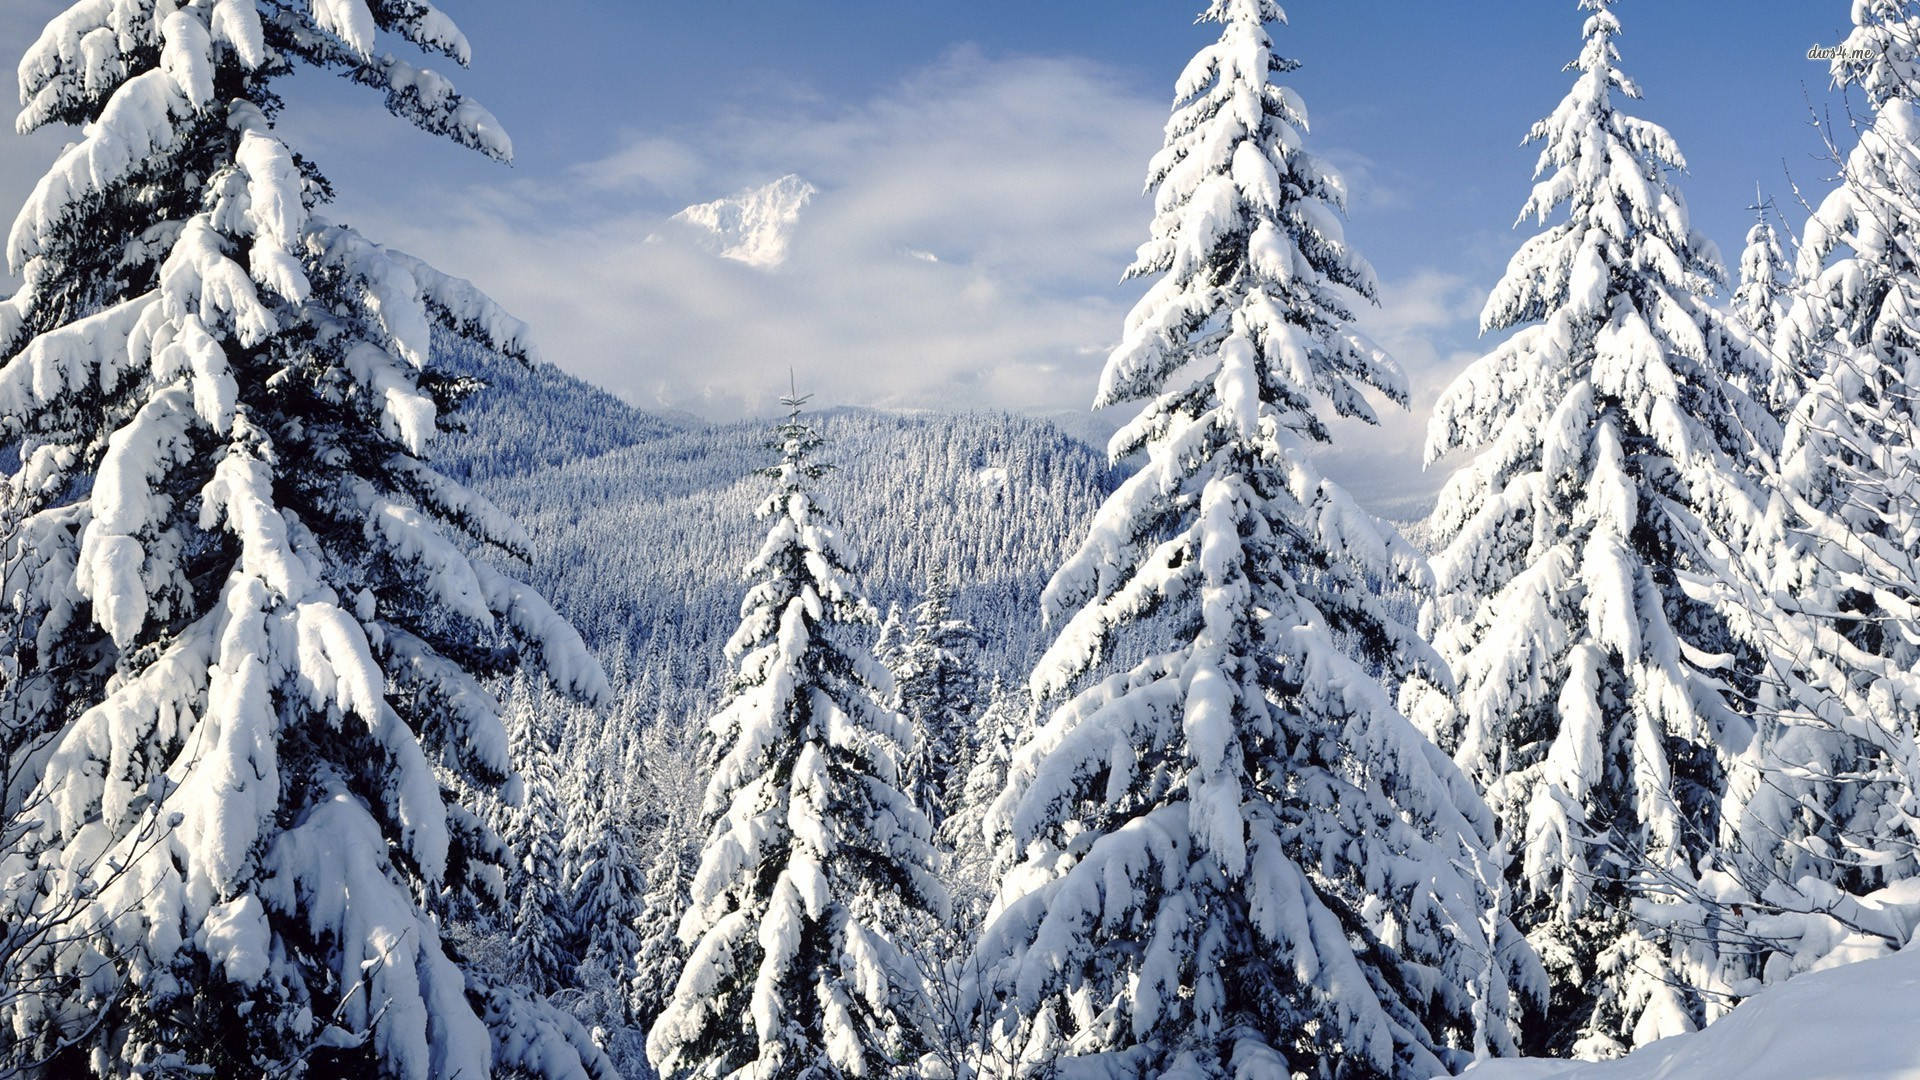 ... Snowy trees wallpaper 1920x1080 ...